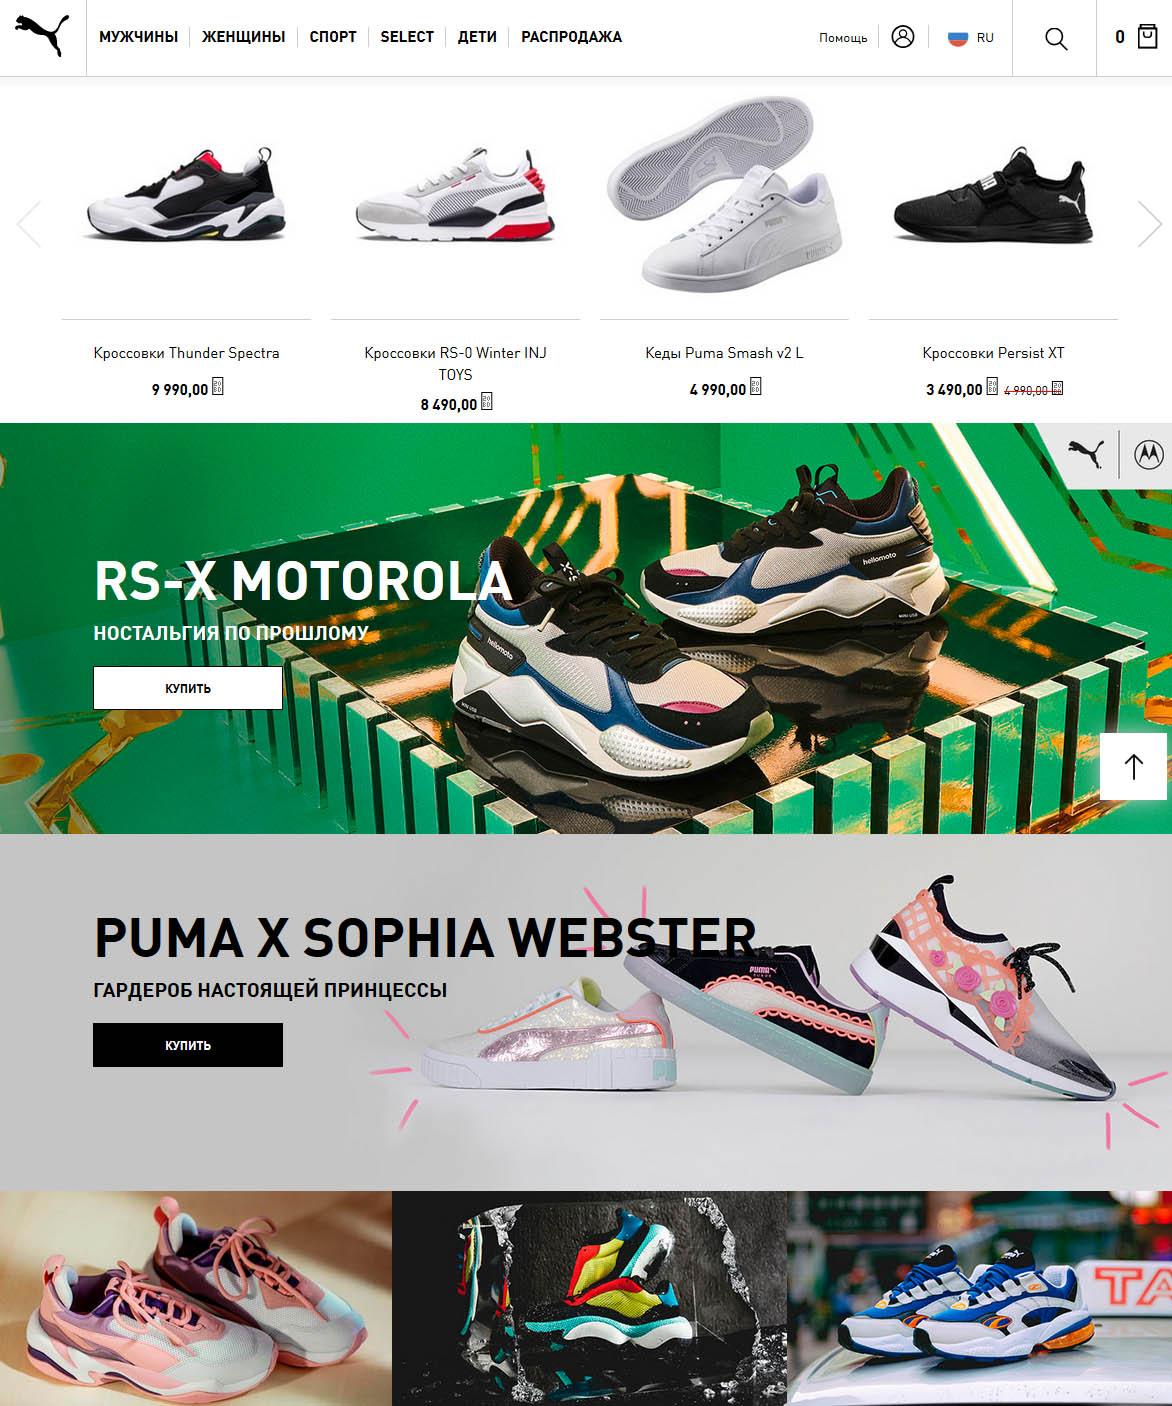 Интернет-магазин Пума